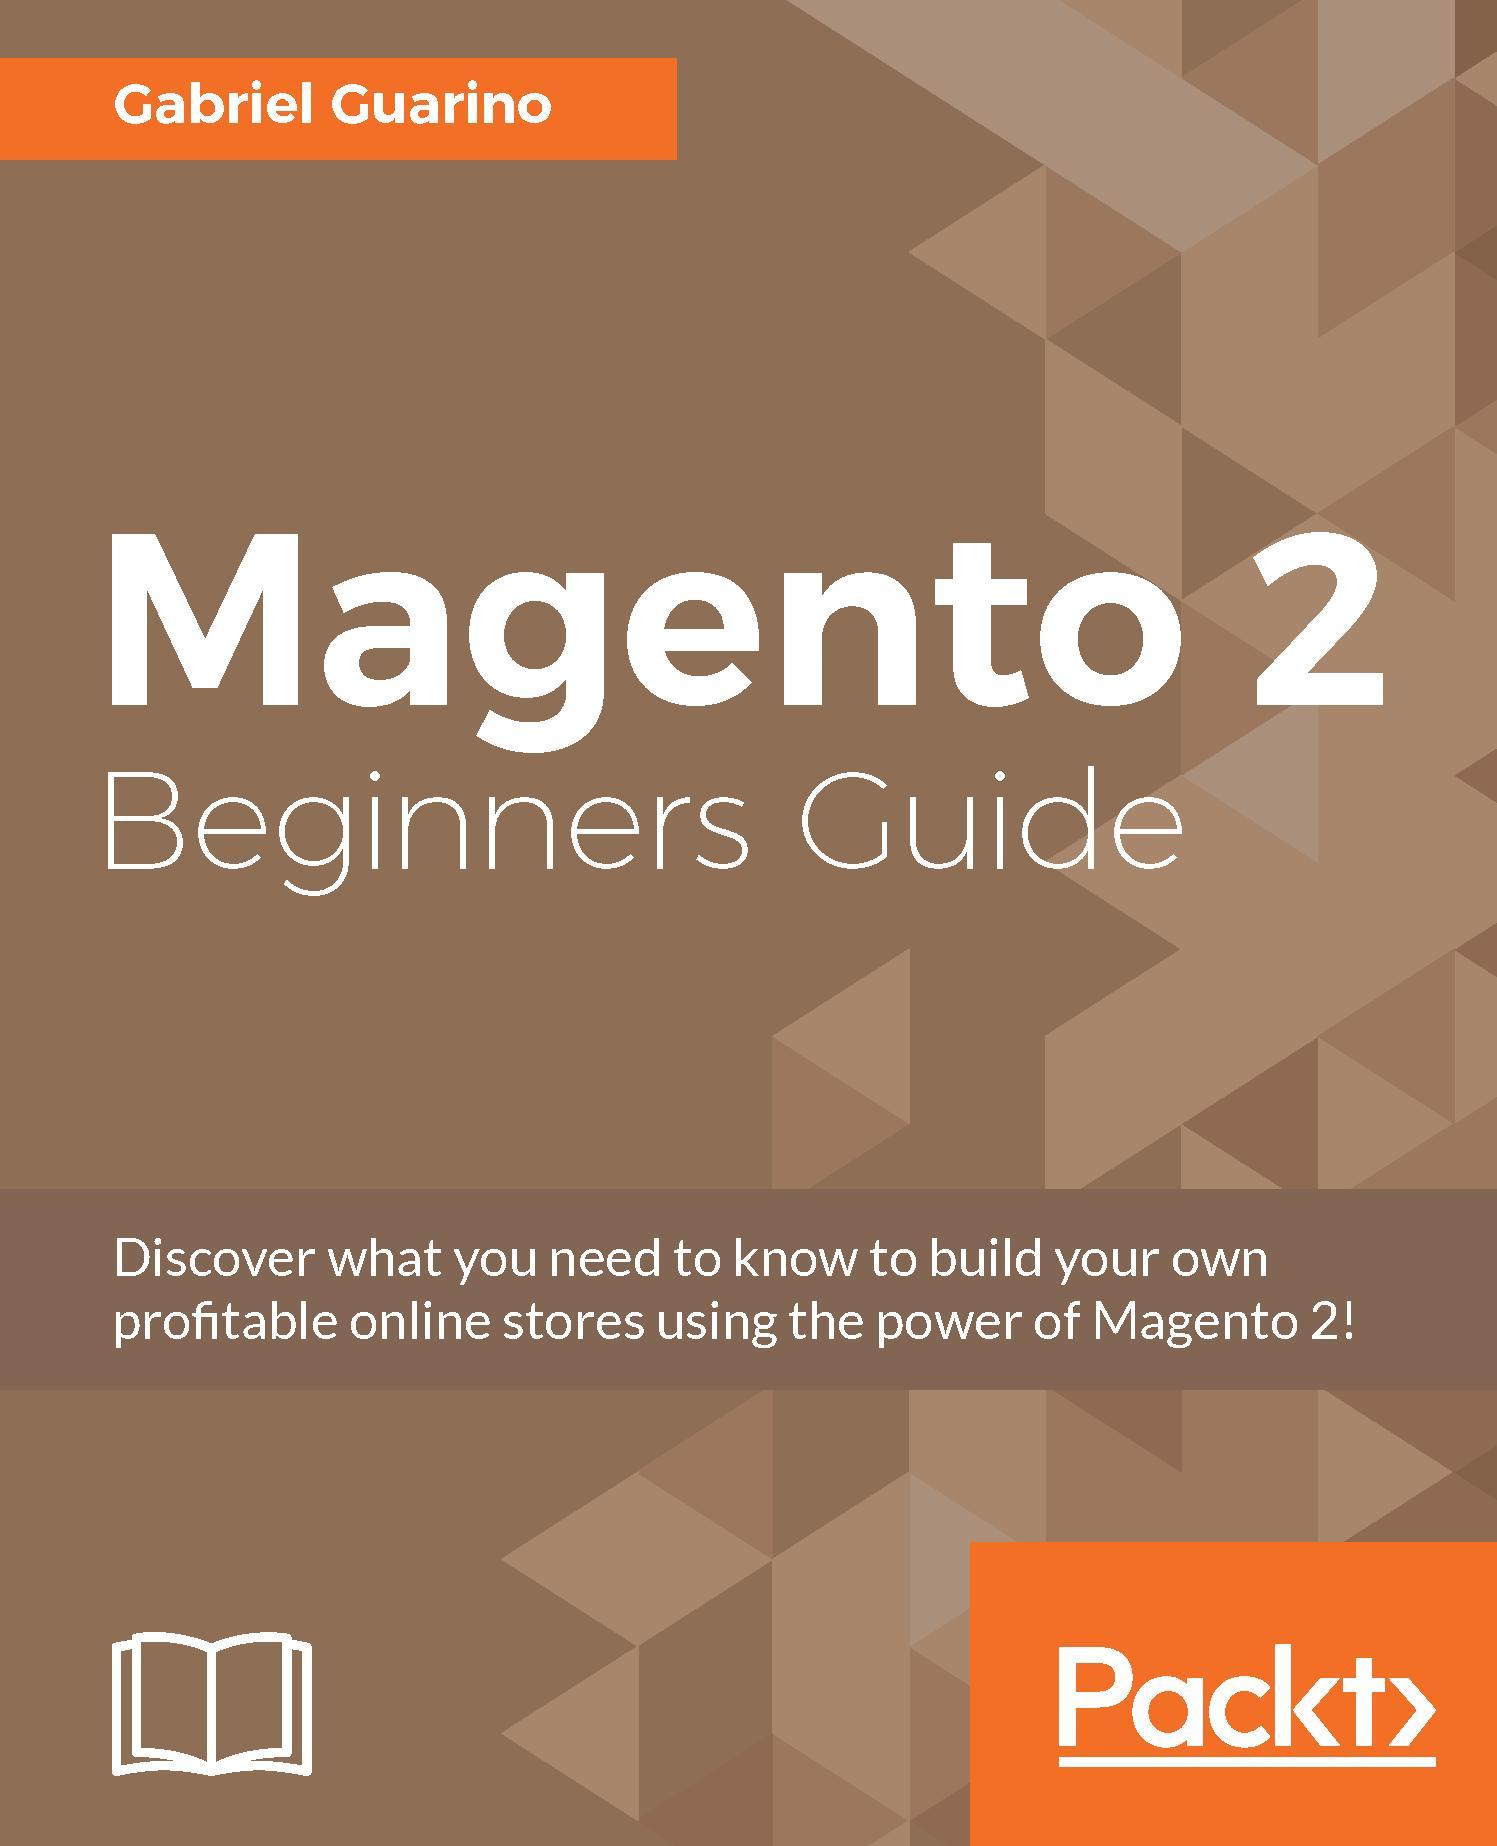 Magento 2 Beginners Guide